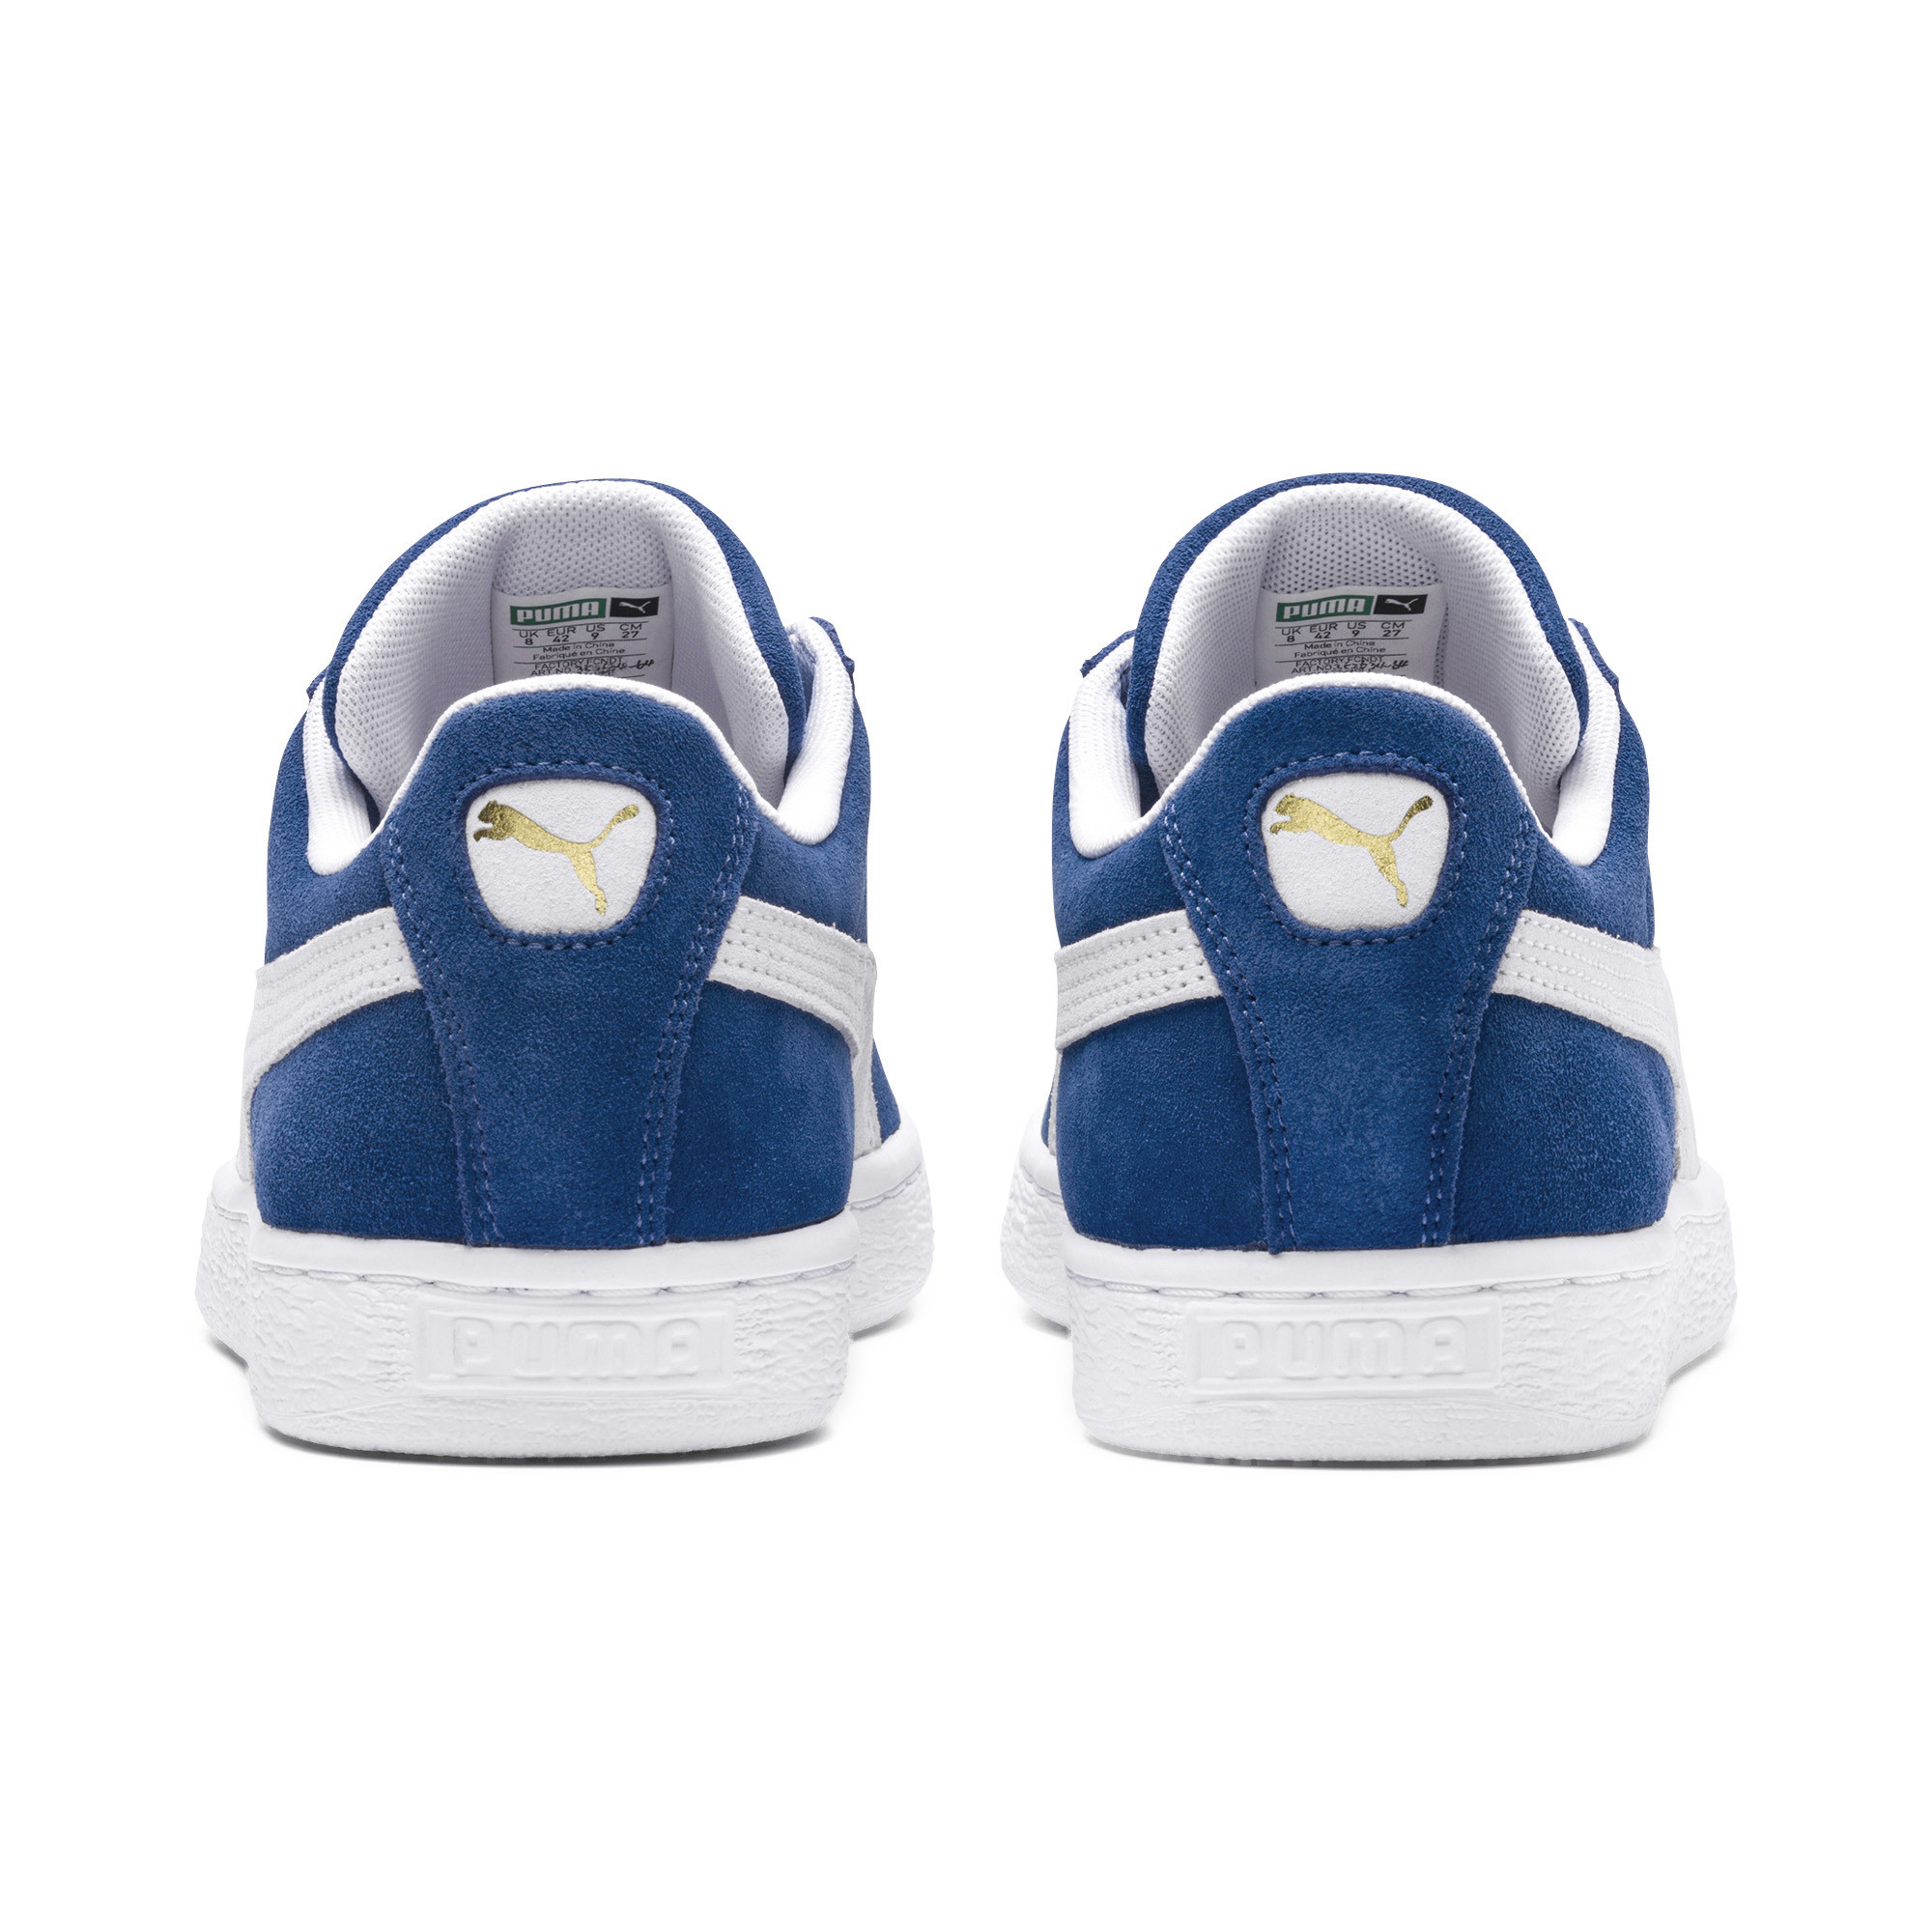 PUMA-Suede-Classic-Sneakers-Men-Shoe-Sport-Shoe thumbnail 9